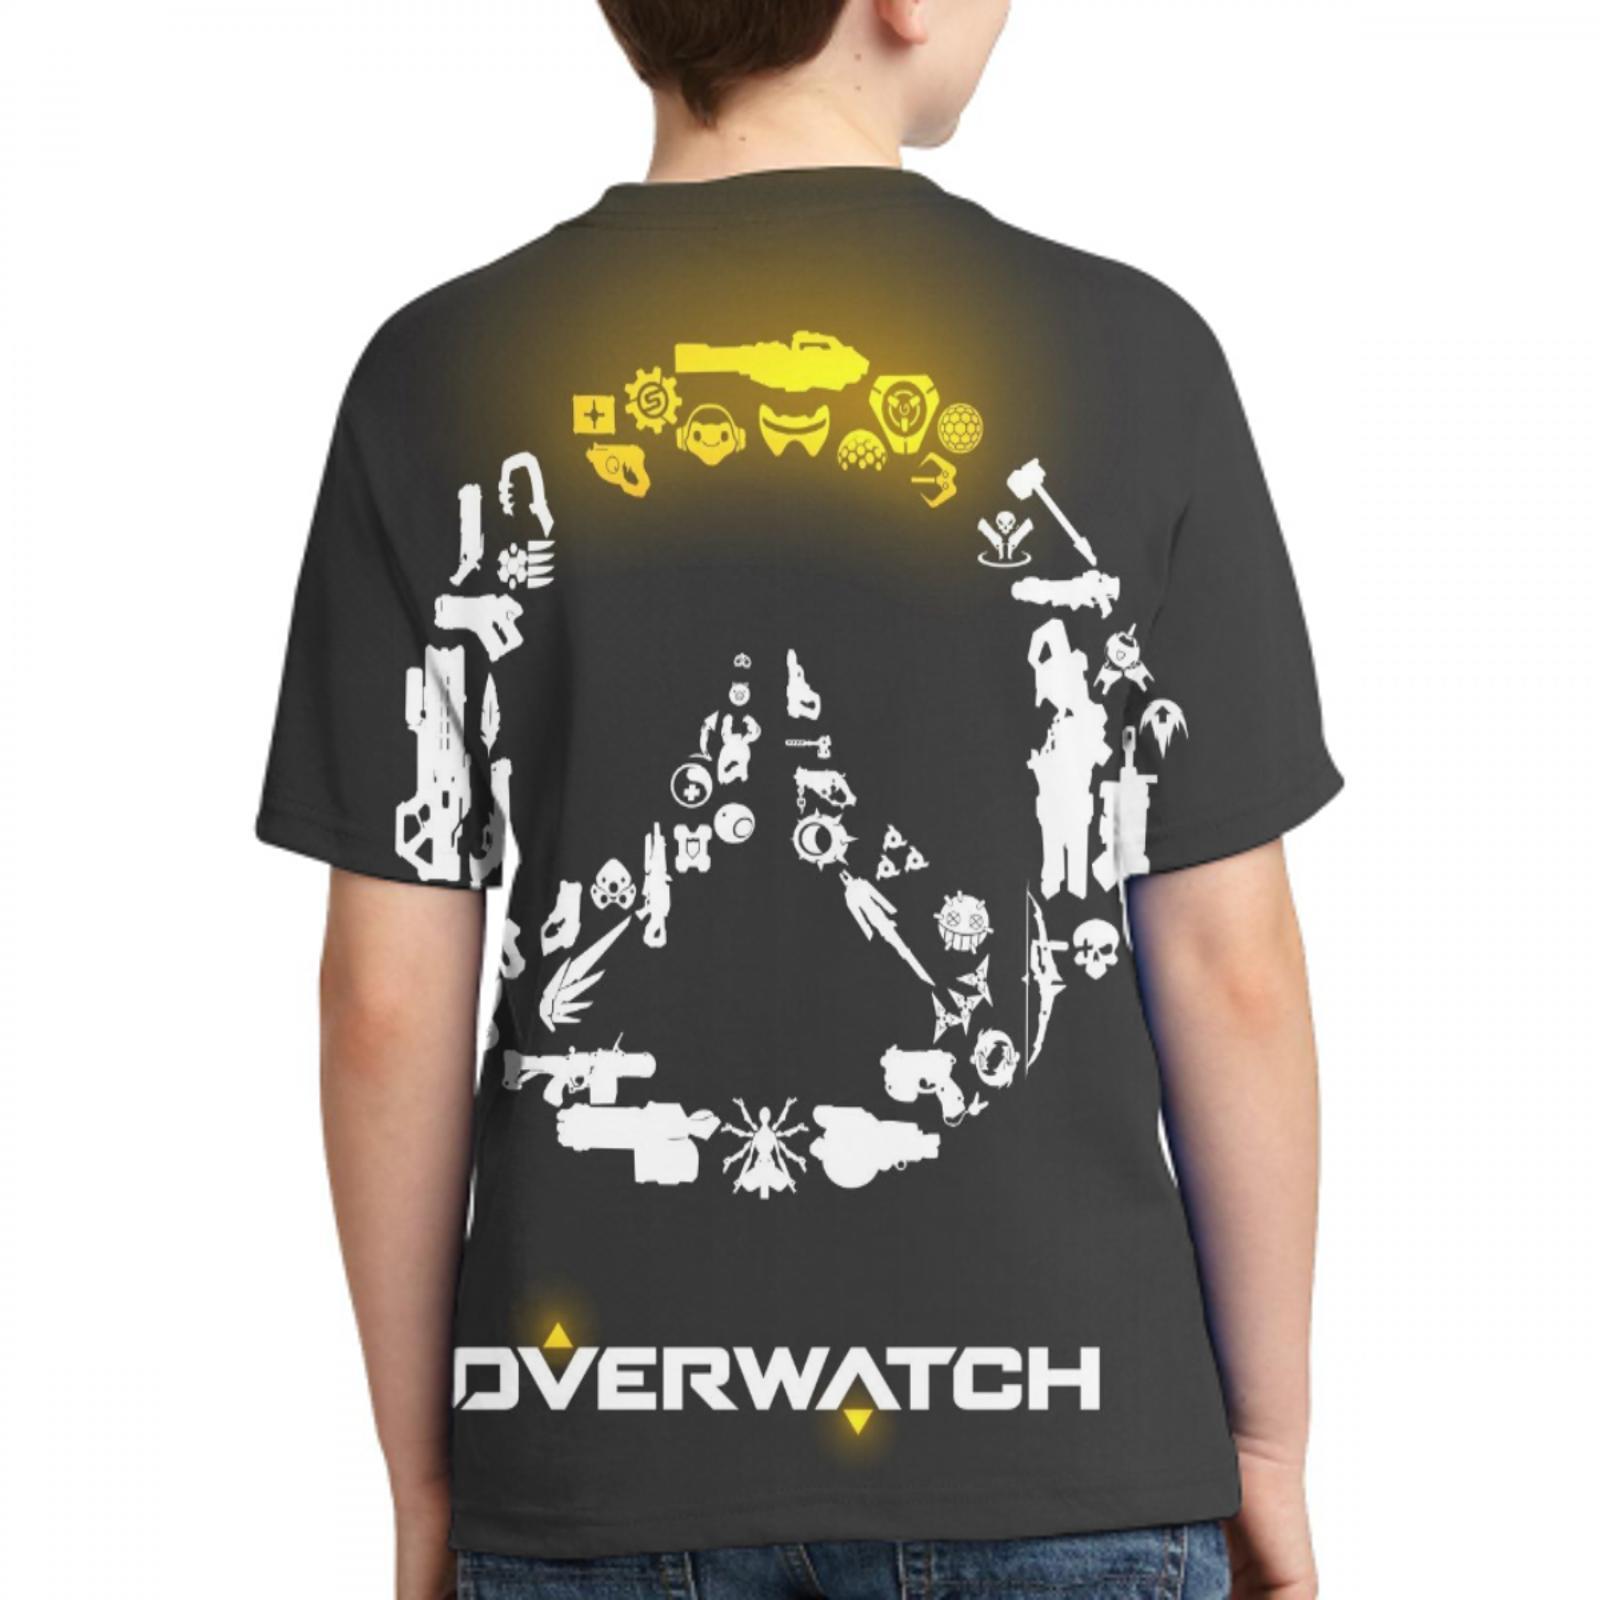 printer overwatch casual t shirt custom ladies/mens oversized t shirt overwatch poster boys/girls t shirt 1